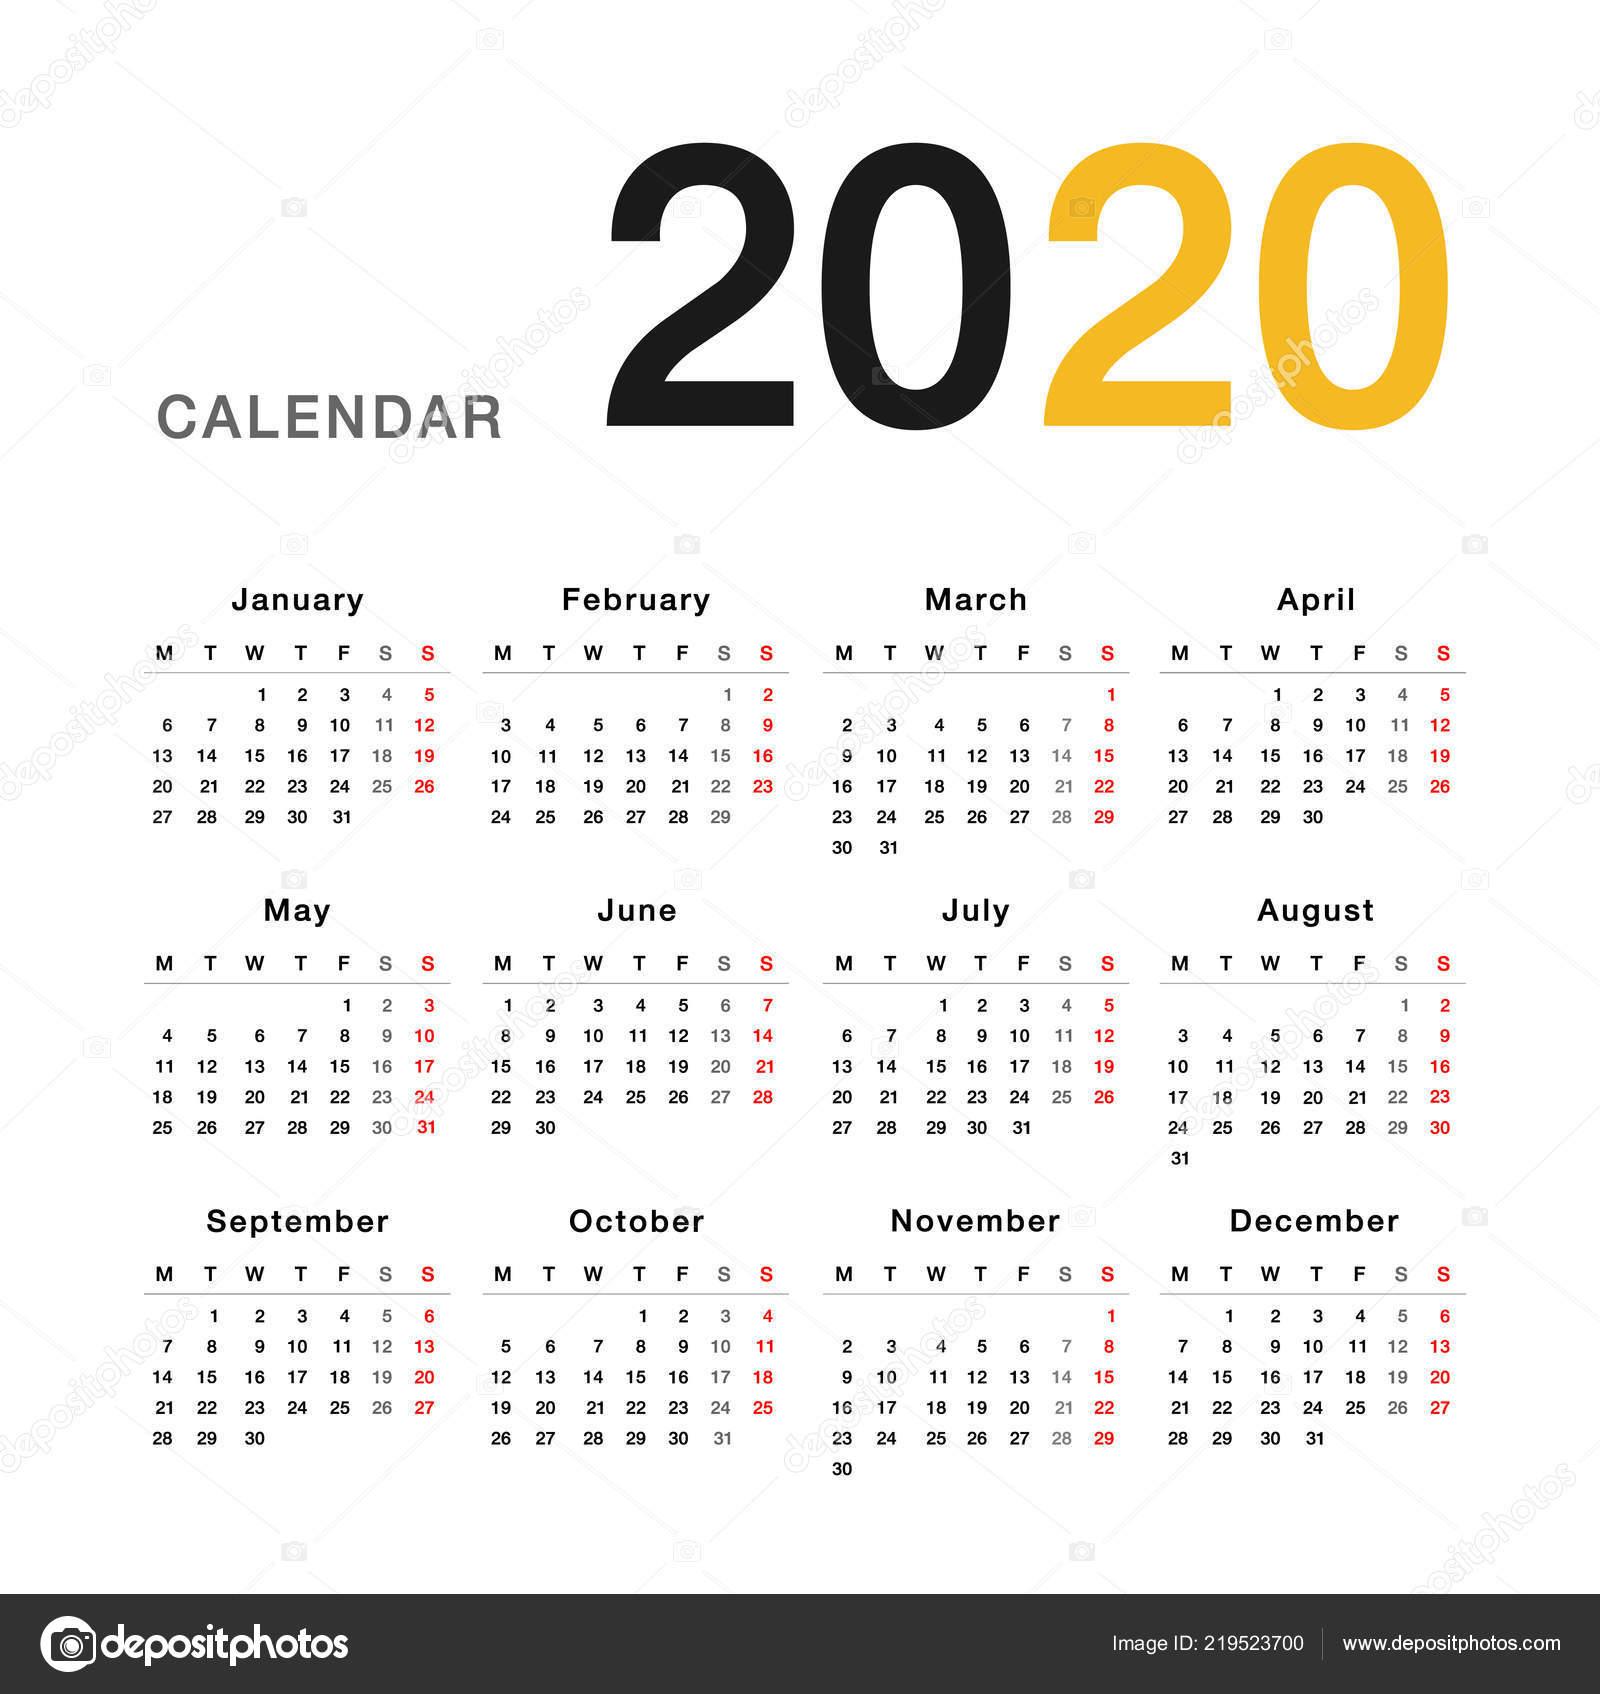 Calendario 2020 Editable Illustrator.Colorful Calendar Year 2020 Vector Design Template Simple